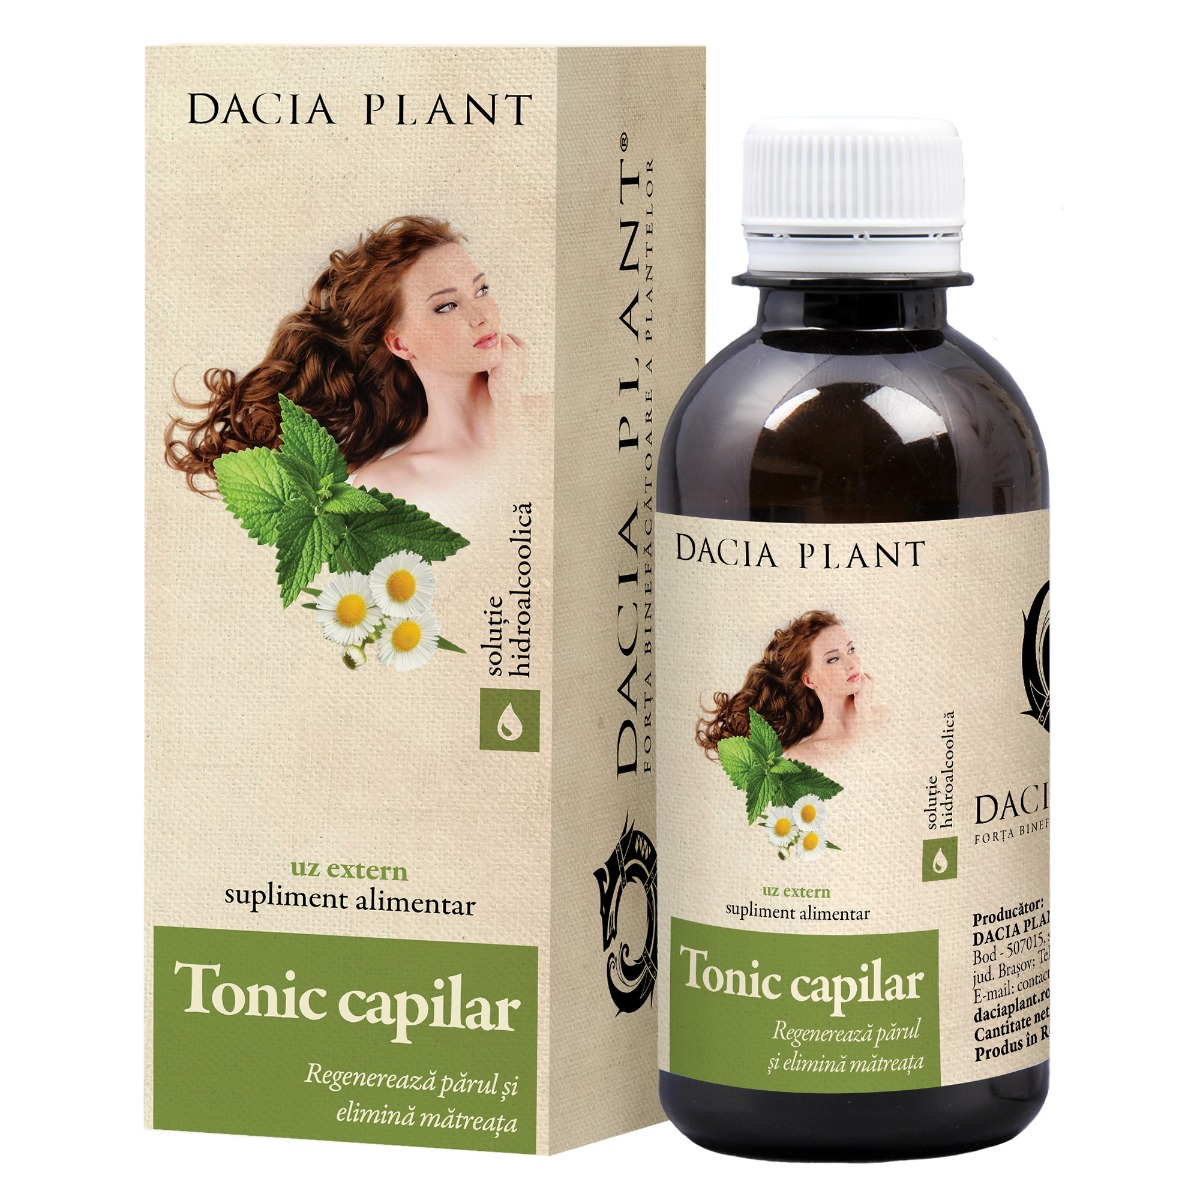 Tonic capilar, 200ml, Dacia Plant drmax.ro